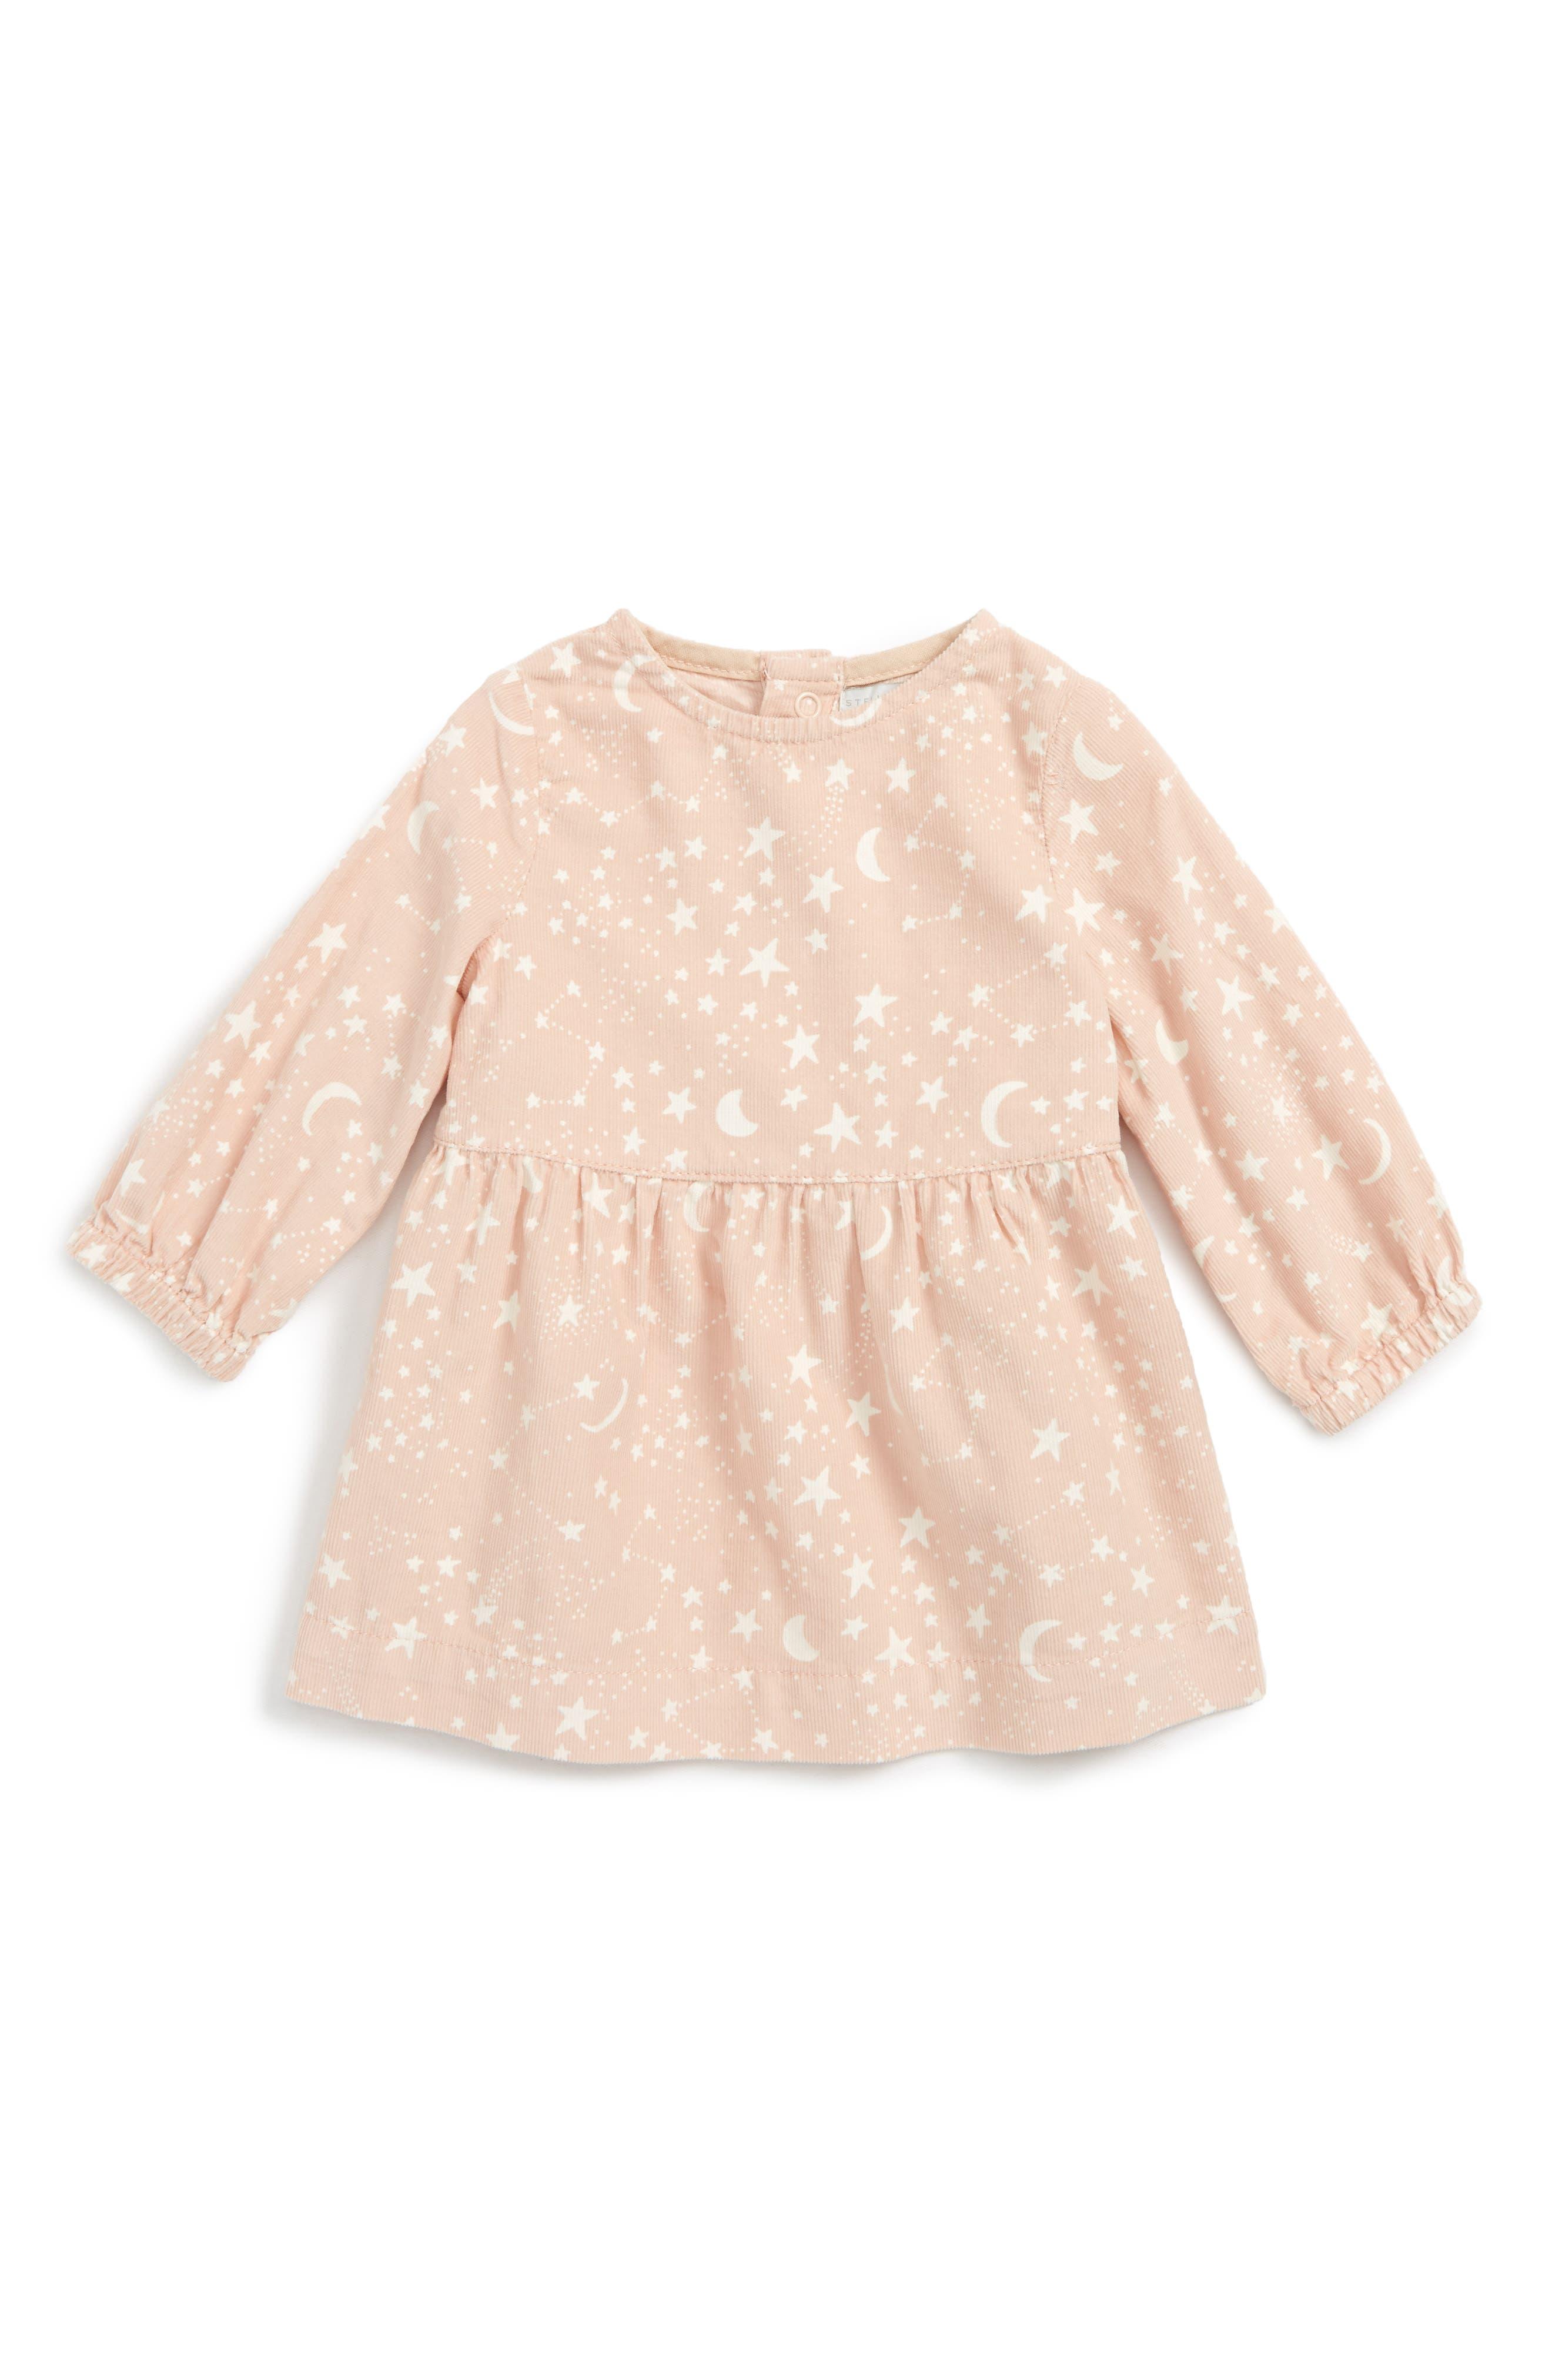 Skippy Star Print Dress,                         Main,                         color, Pink